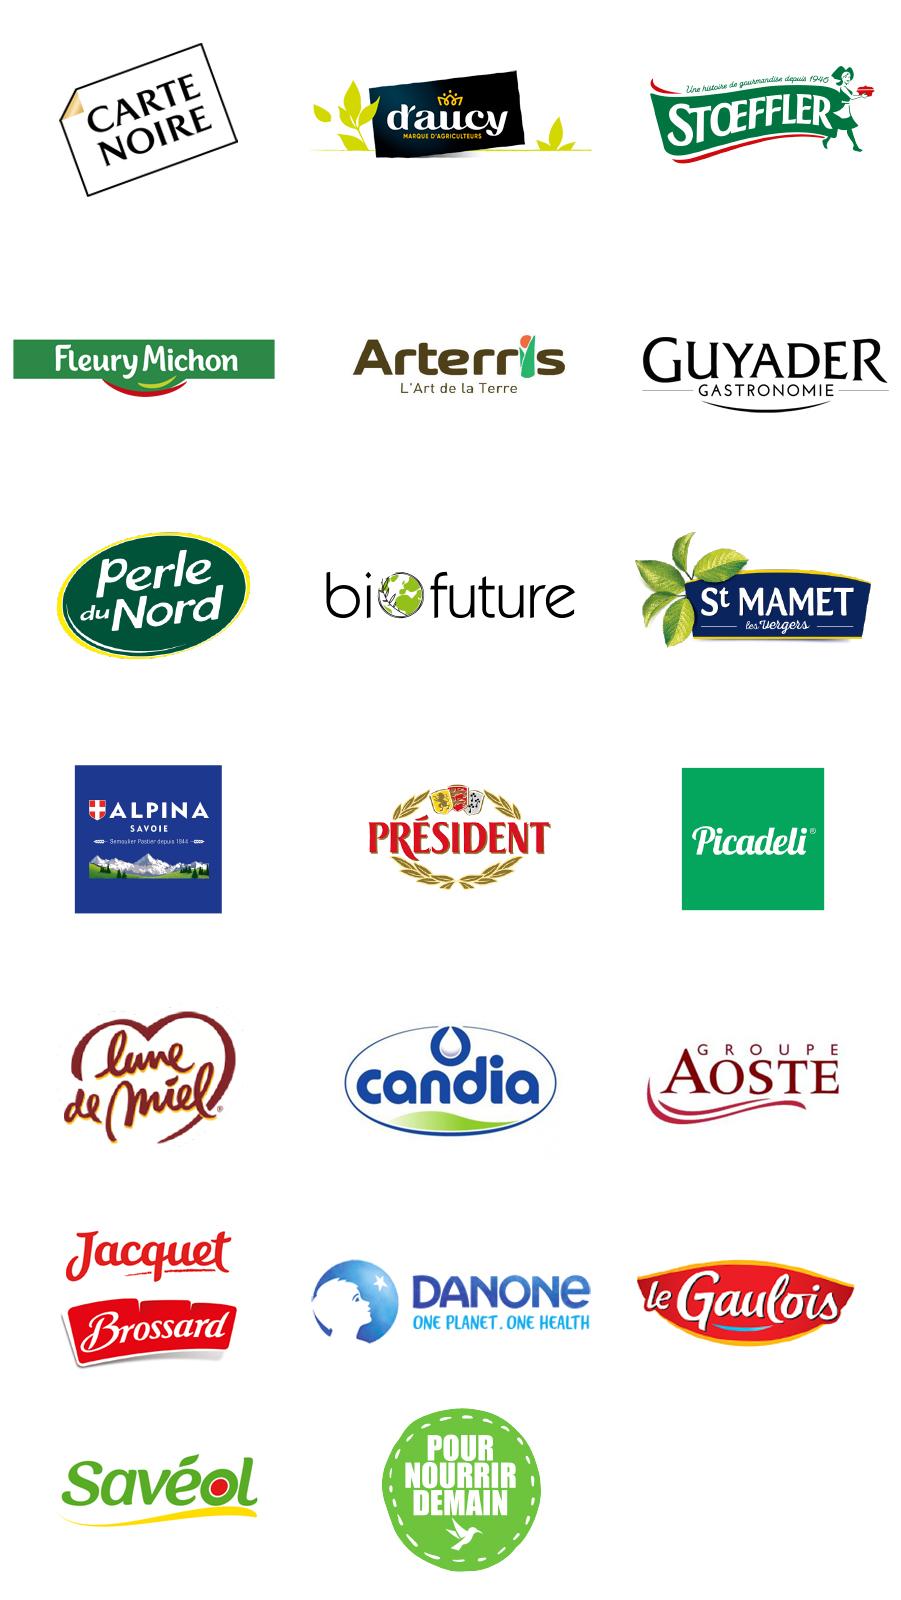 banniere2 - La Communauté qui va faire progresser l'alimentation durable